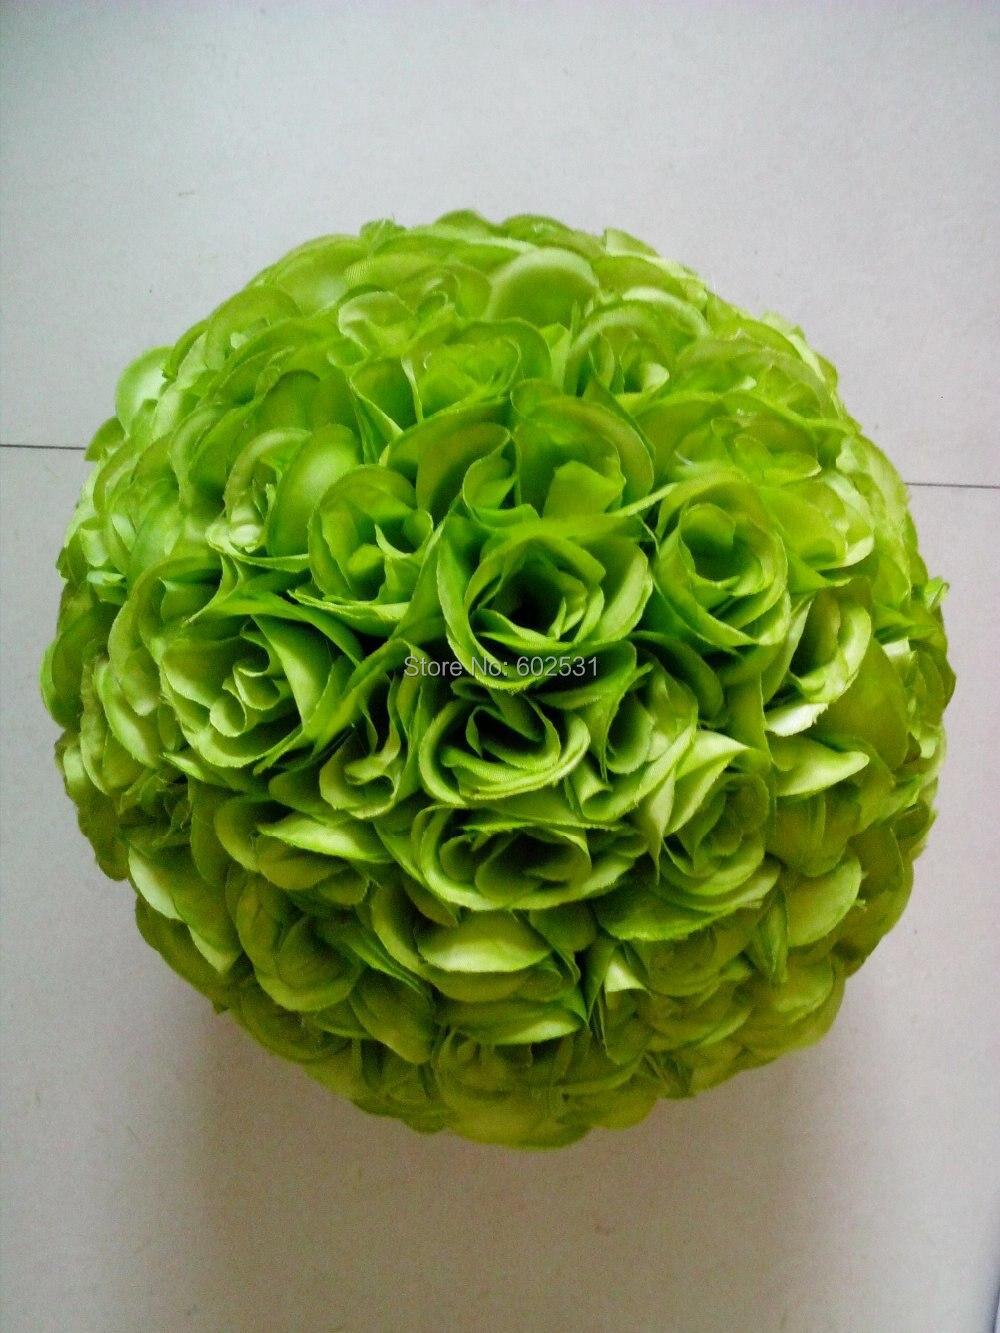 Spr 30cm Plastic Center Wedding Kissing Flower Ball 23 Colors Option Wedding Decorations Flowers Silk Artificial Flowers